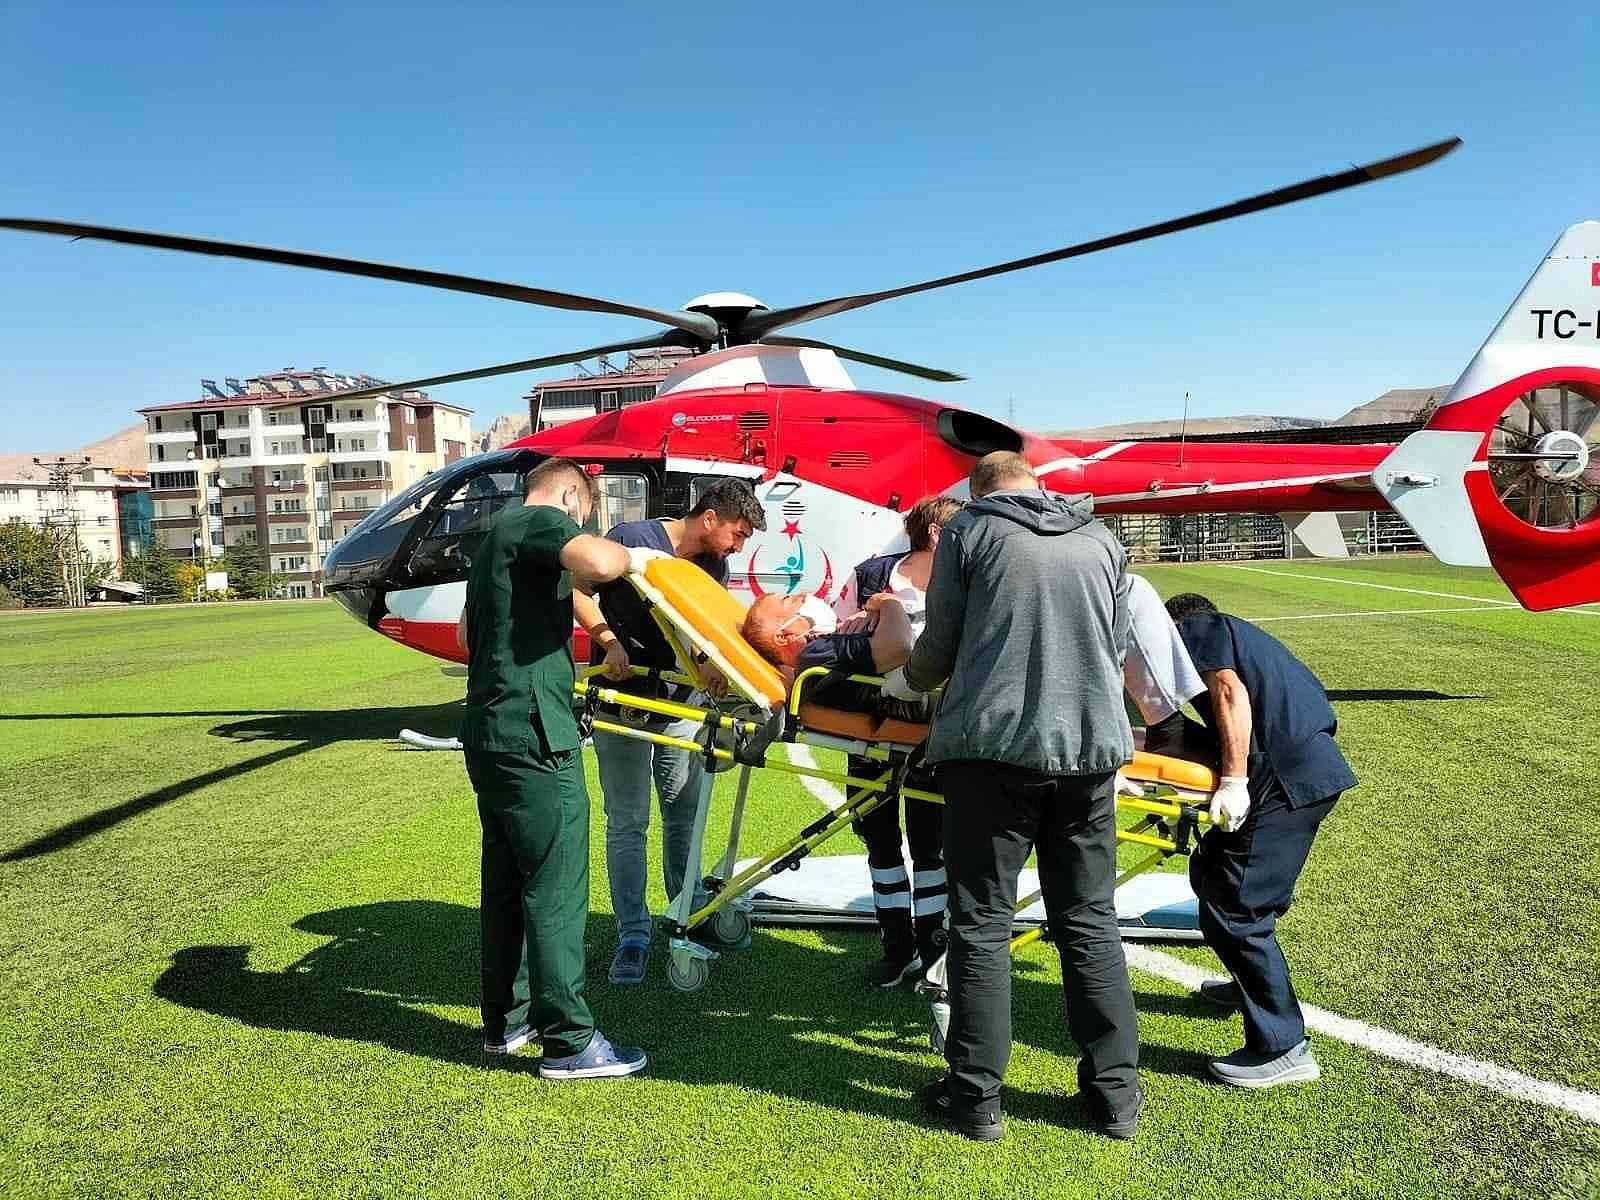 2021/10/ambulans-helikopter-kalp-krizi-geciren-hasta-icin-havalandi-20211012AW43-3.jpg